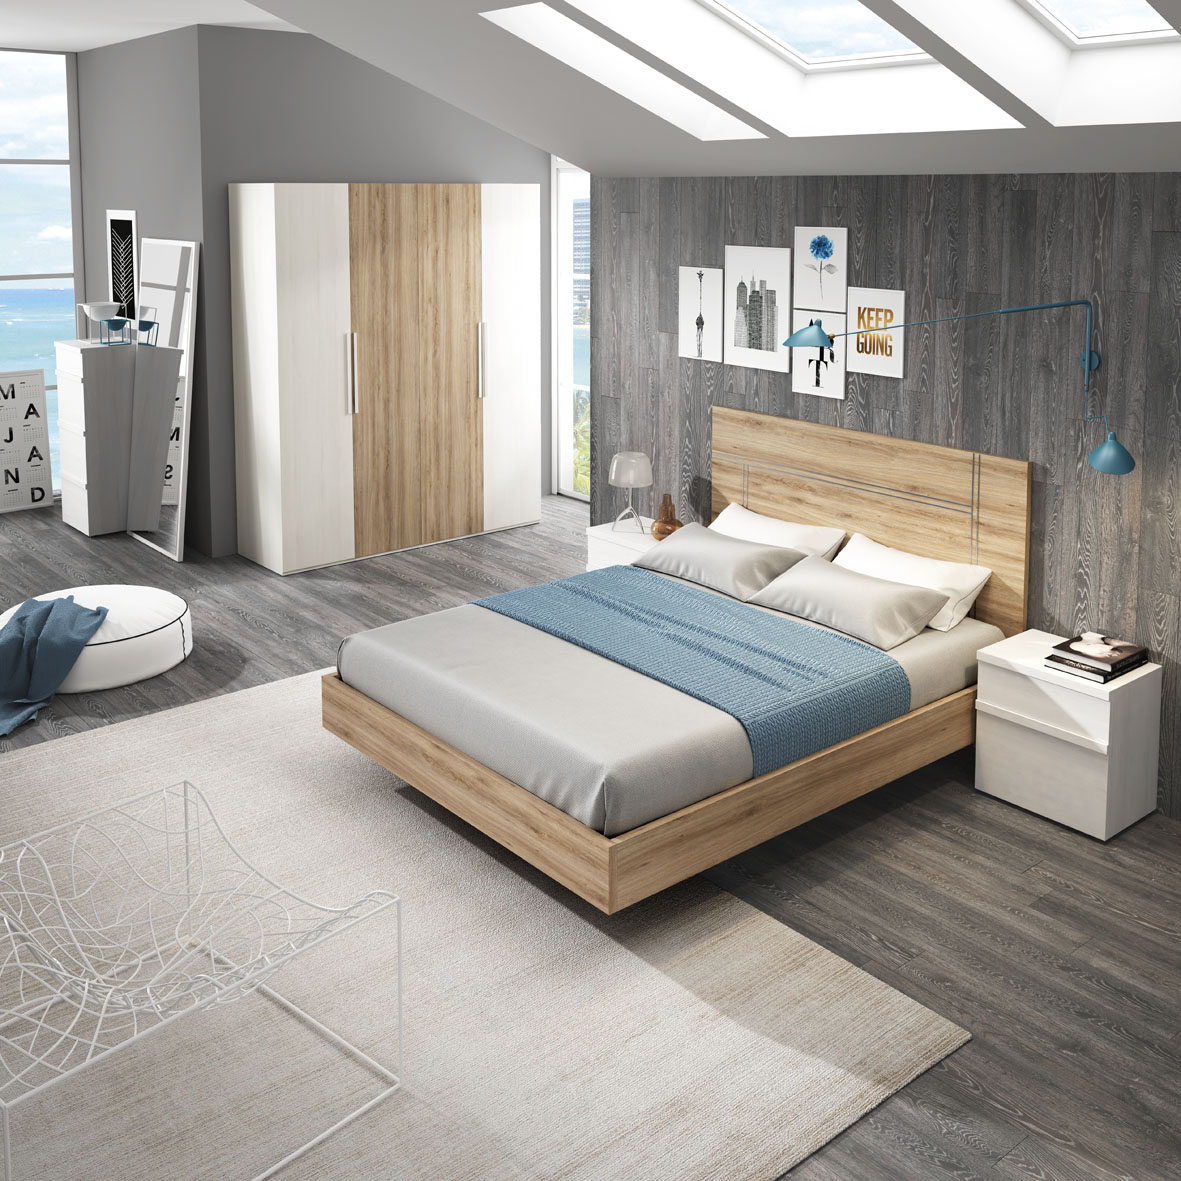 dormitorios-modernos-Neo.2-muebles-paco-caballero-907-5d10b20d3c141